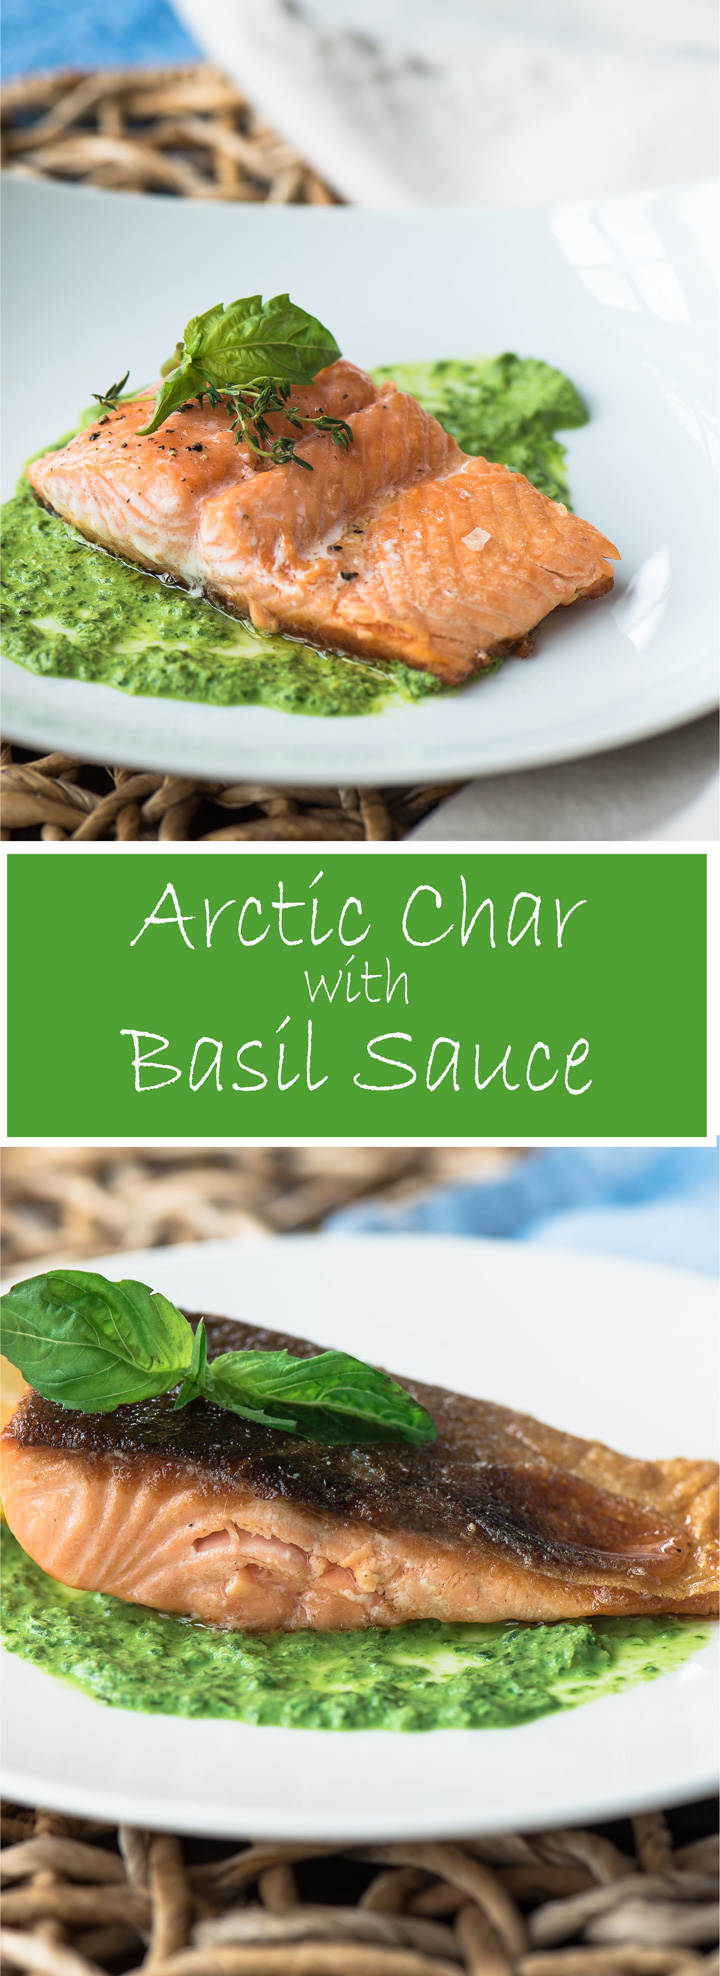 Arctic Char with Basil Sauce